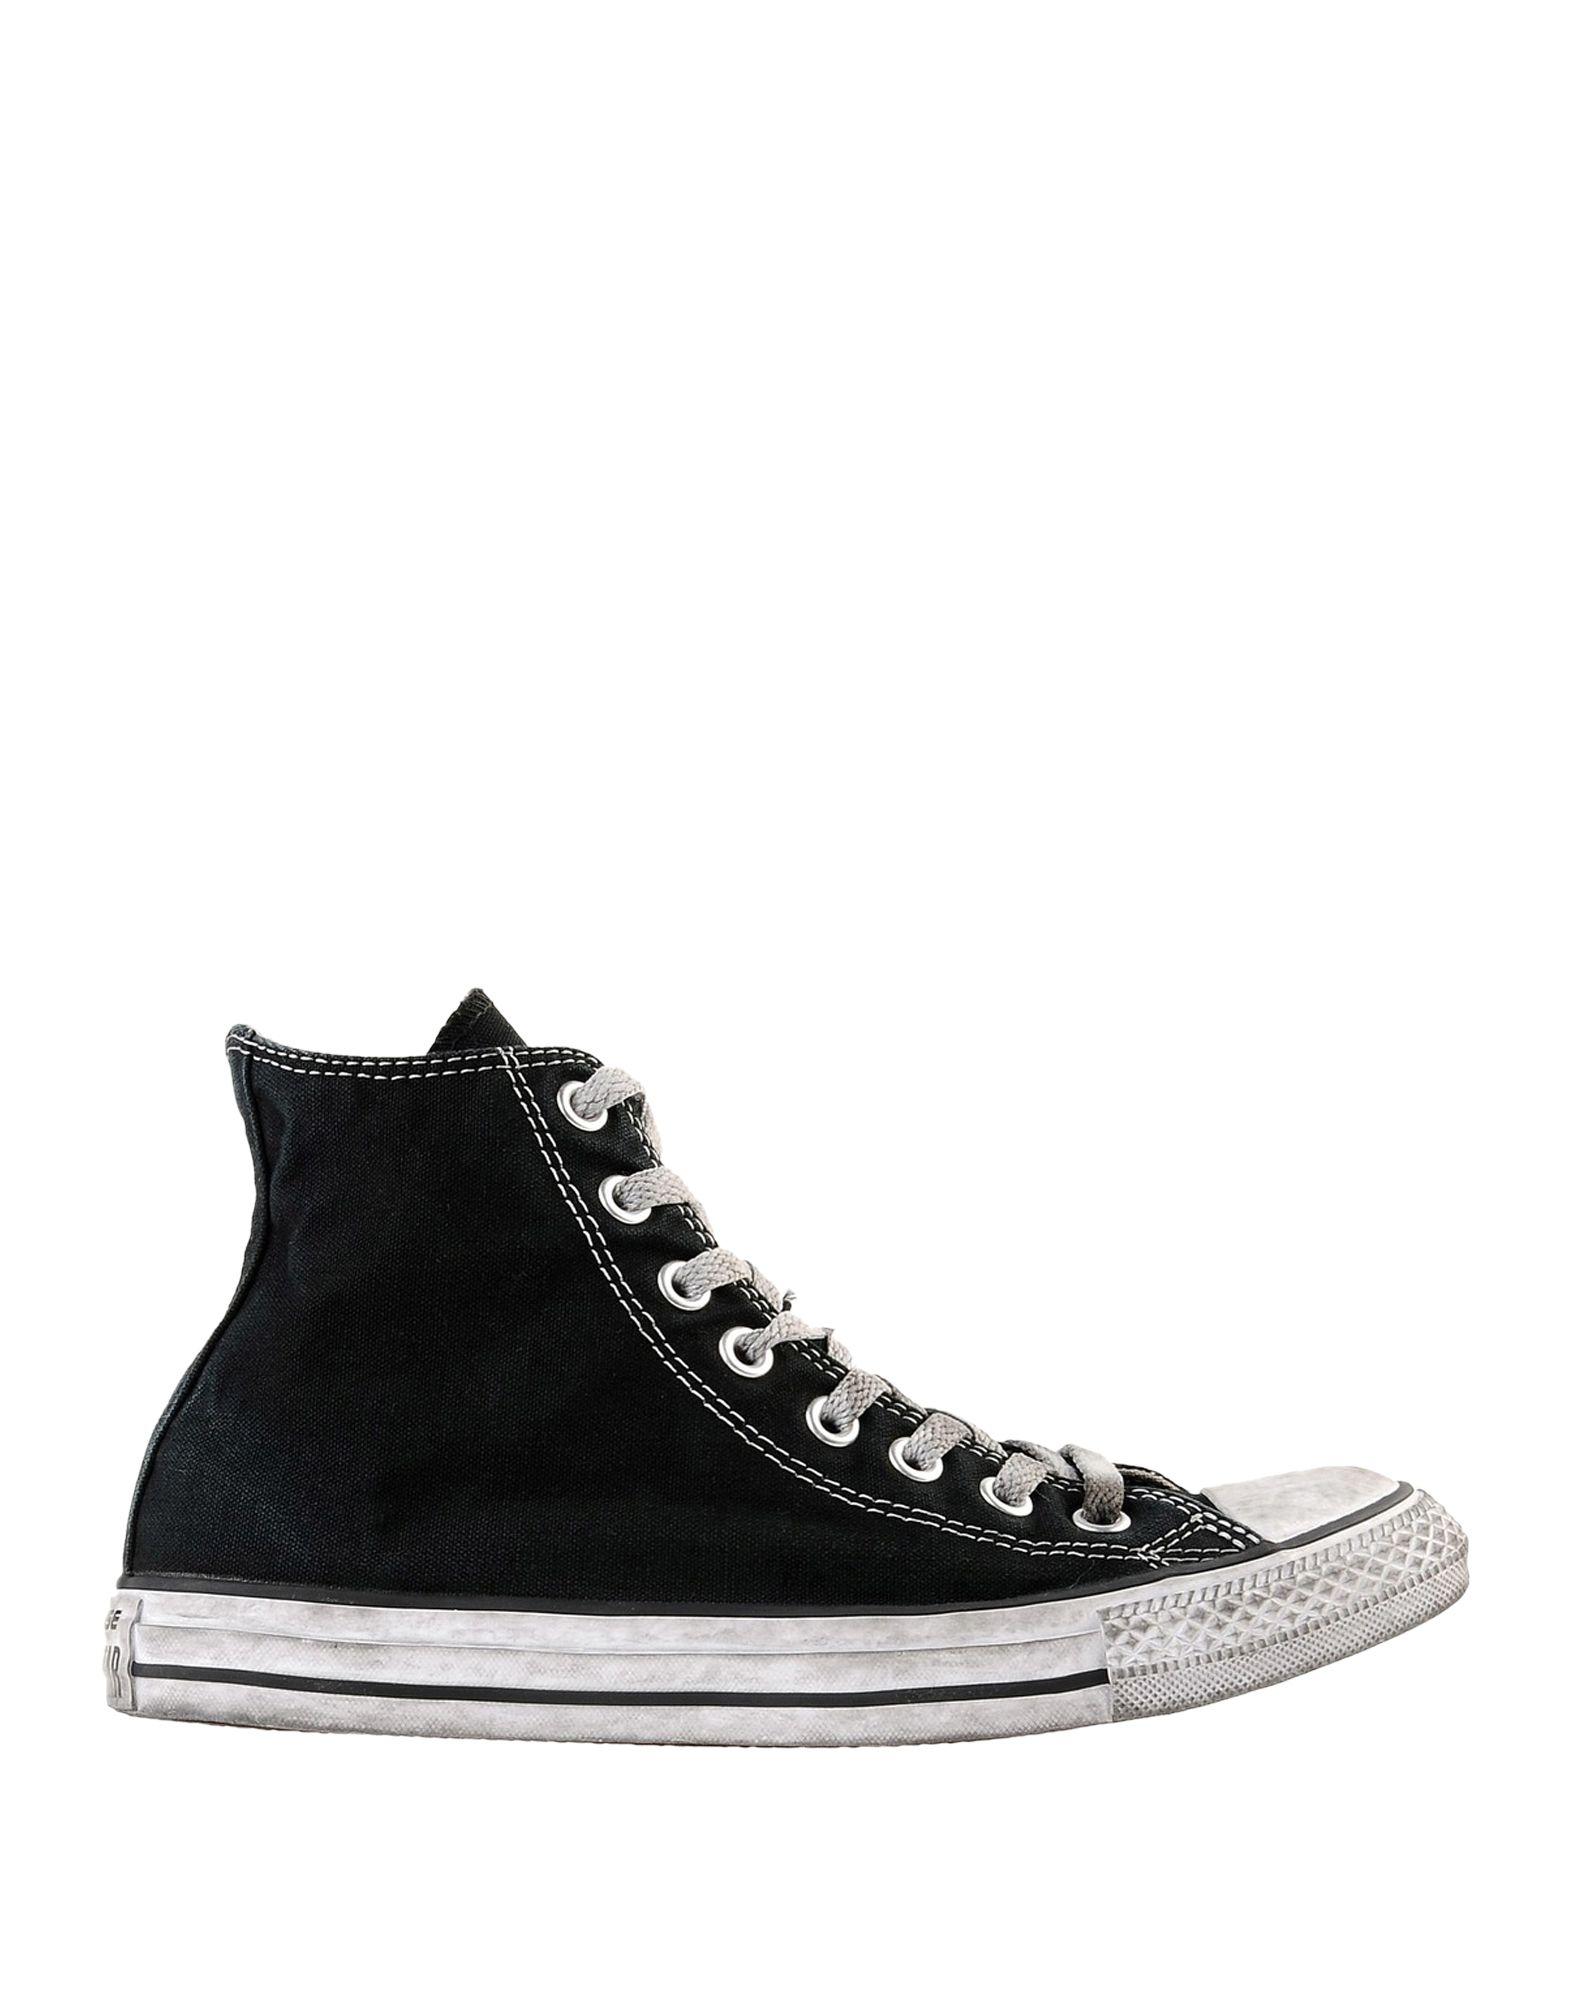 Scarpe da Ginnastica Converse Limited - Edition Ctas Leather Ltd - Limited Donna - 11551585AU 188aef